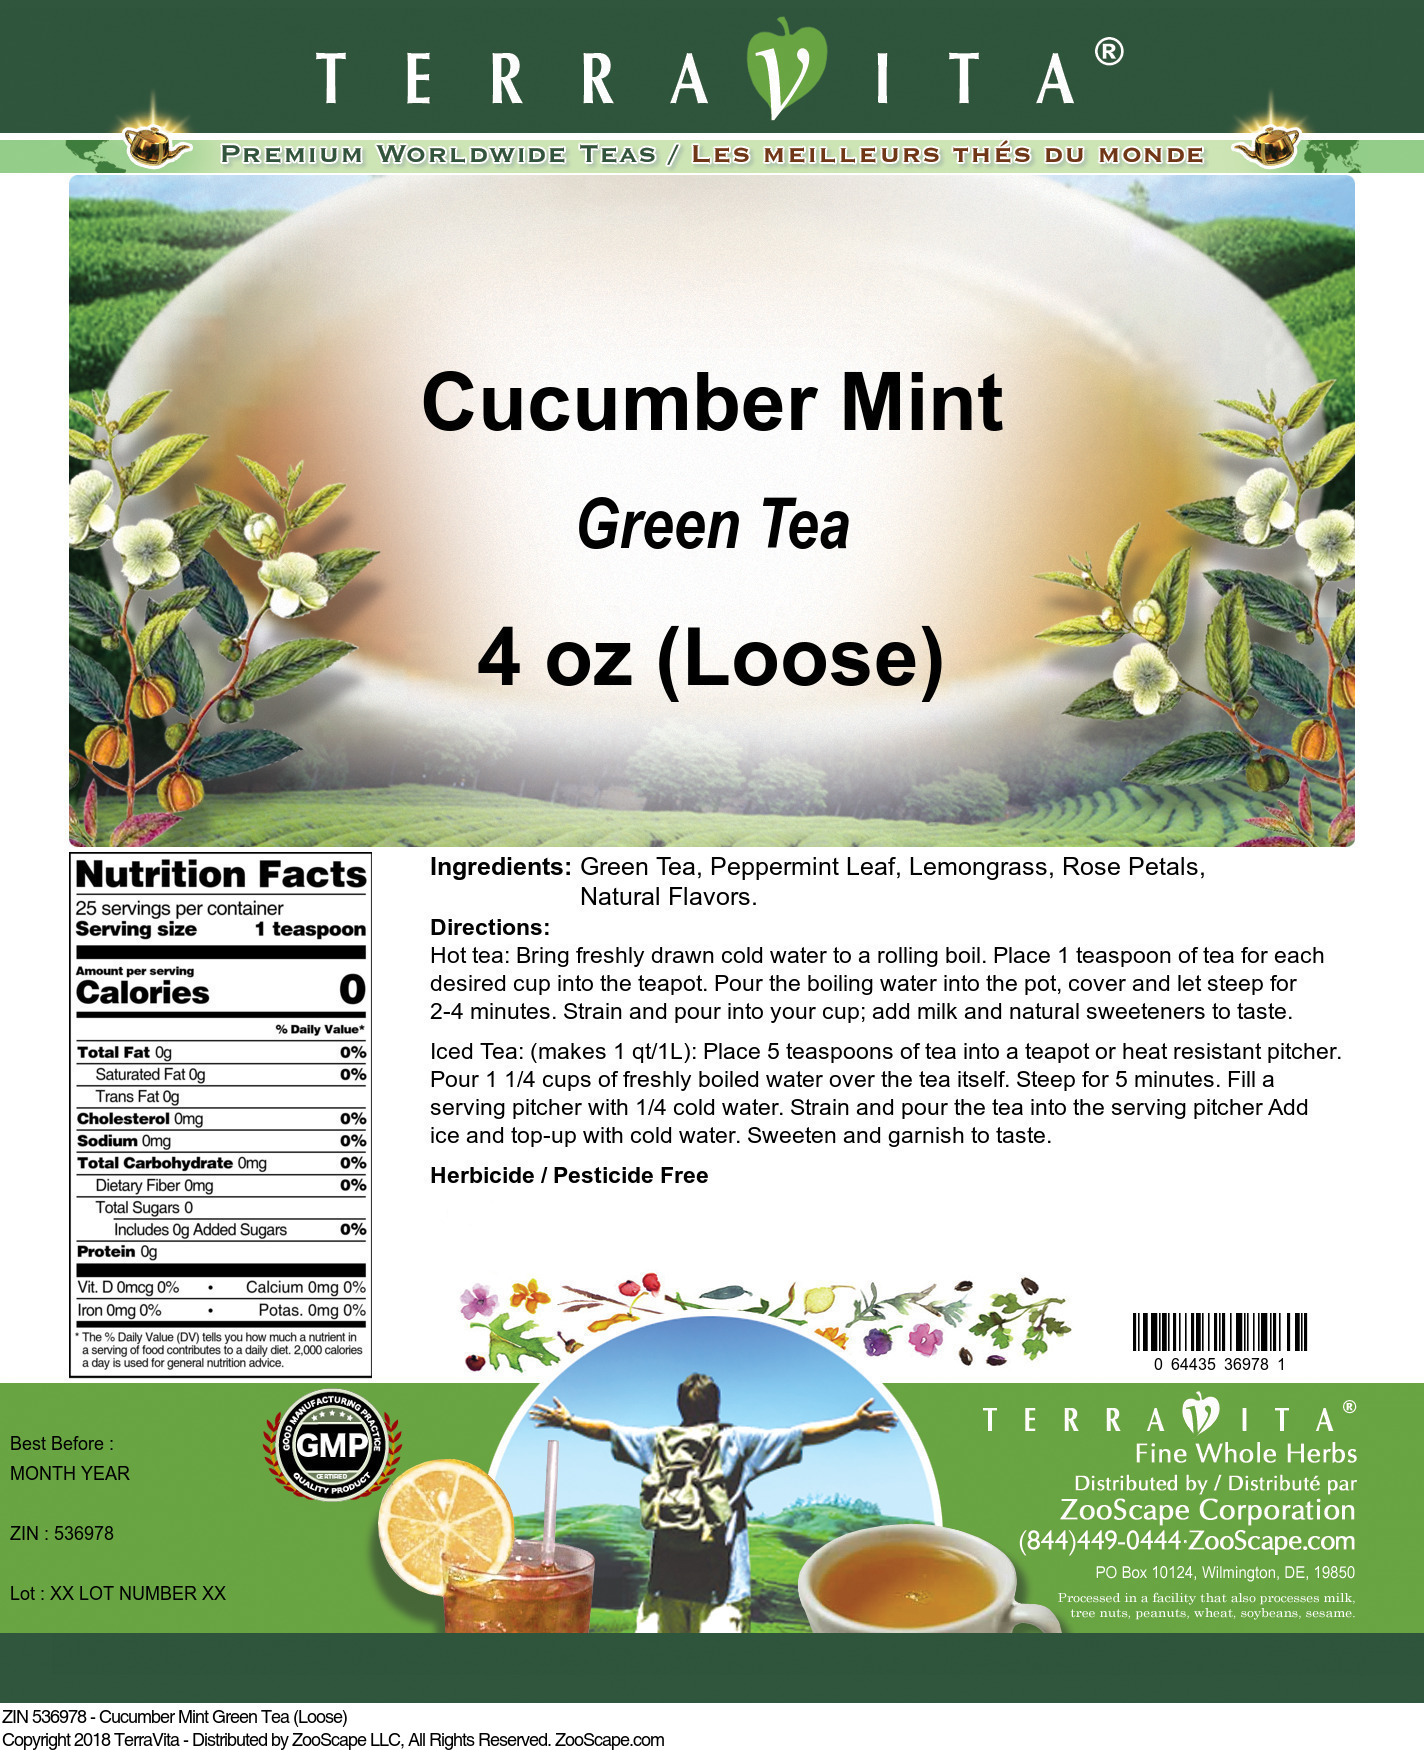 Cucumber Mint Green Tea